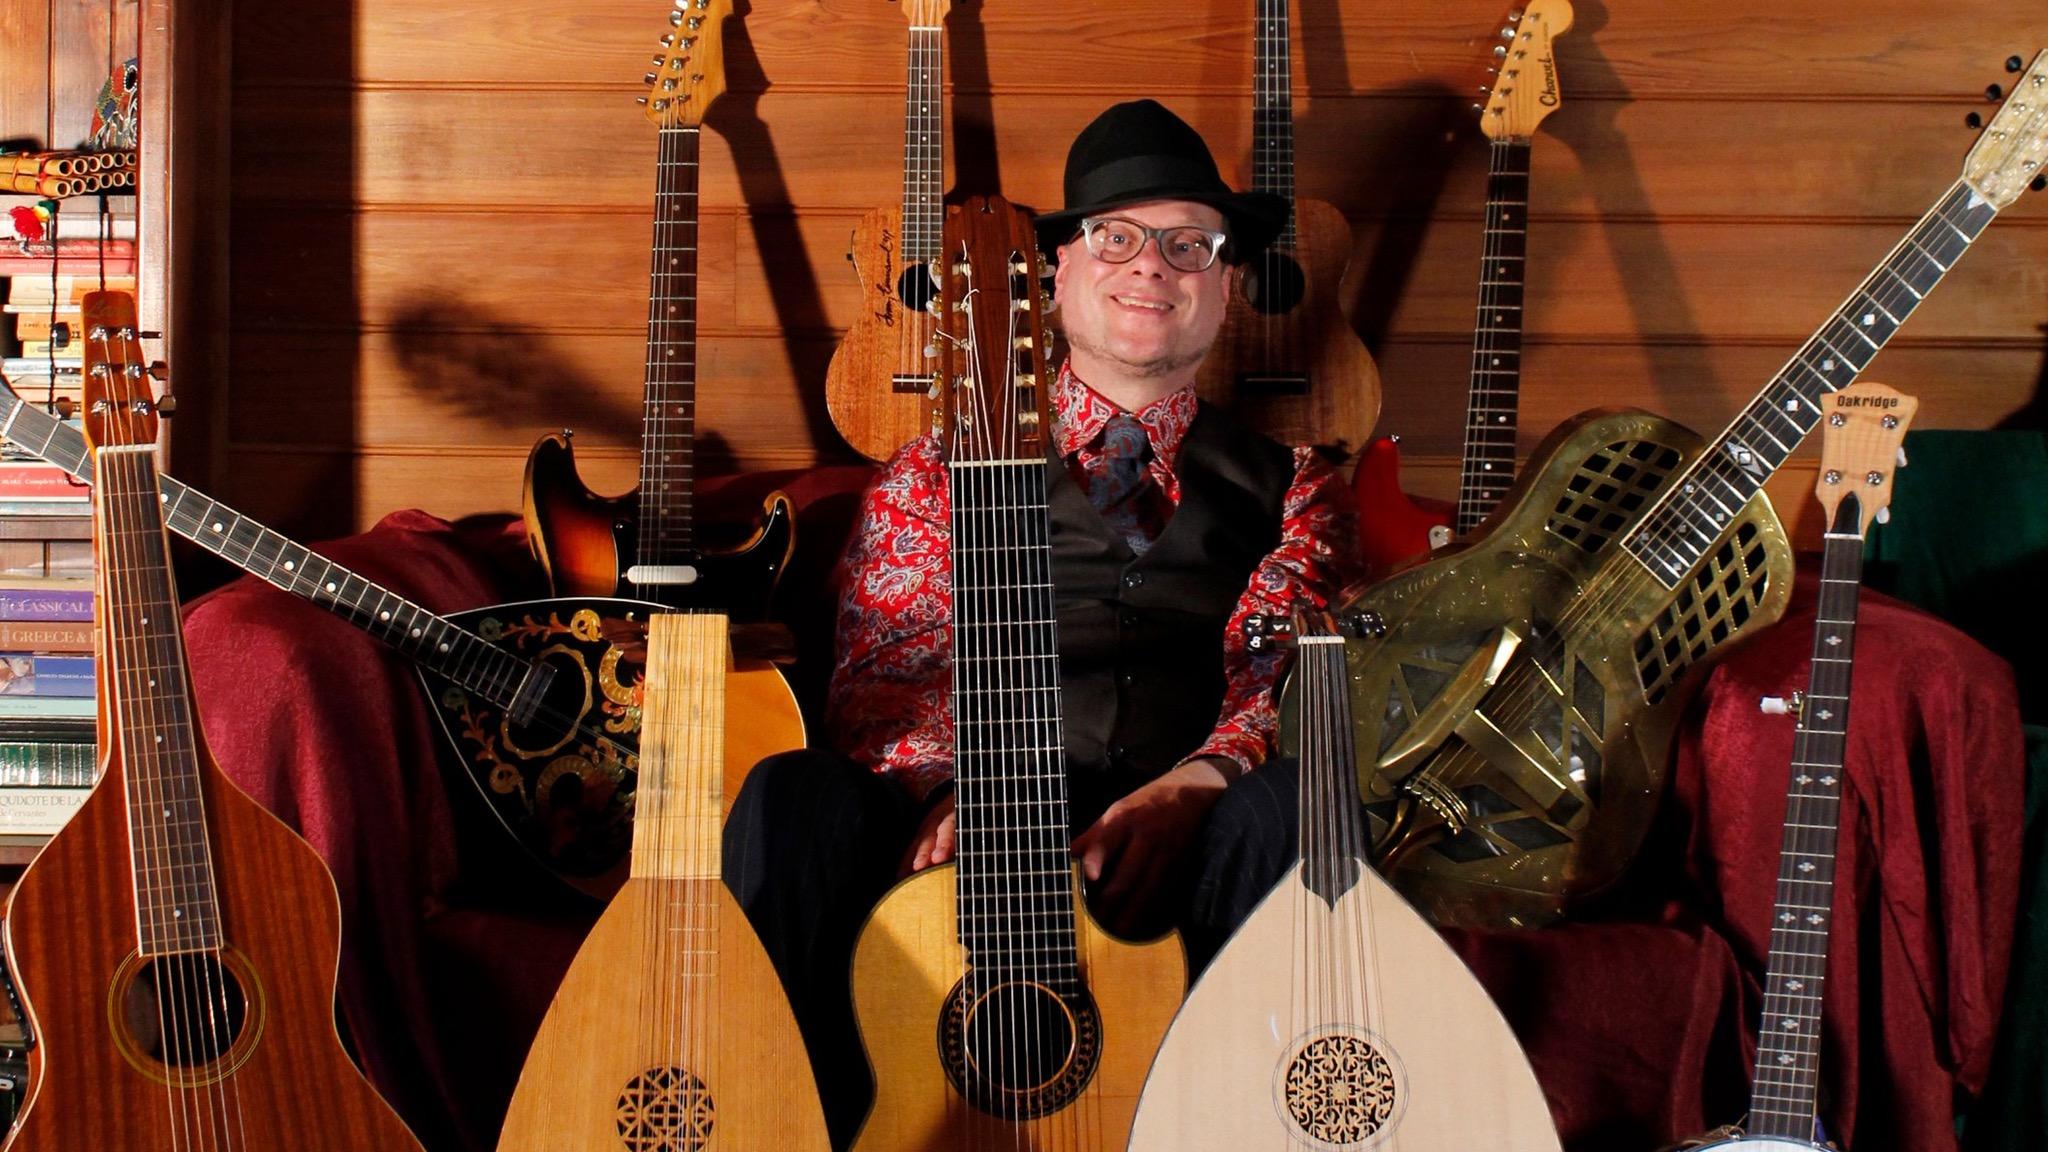 Matthew Fagan- Lord of the Strings